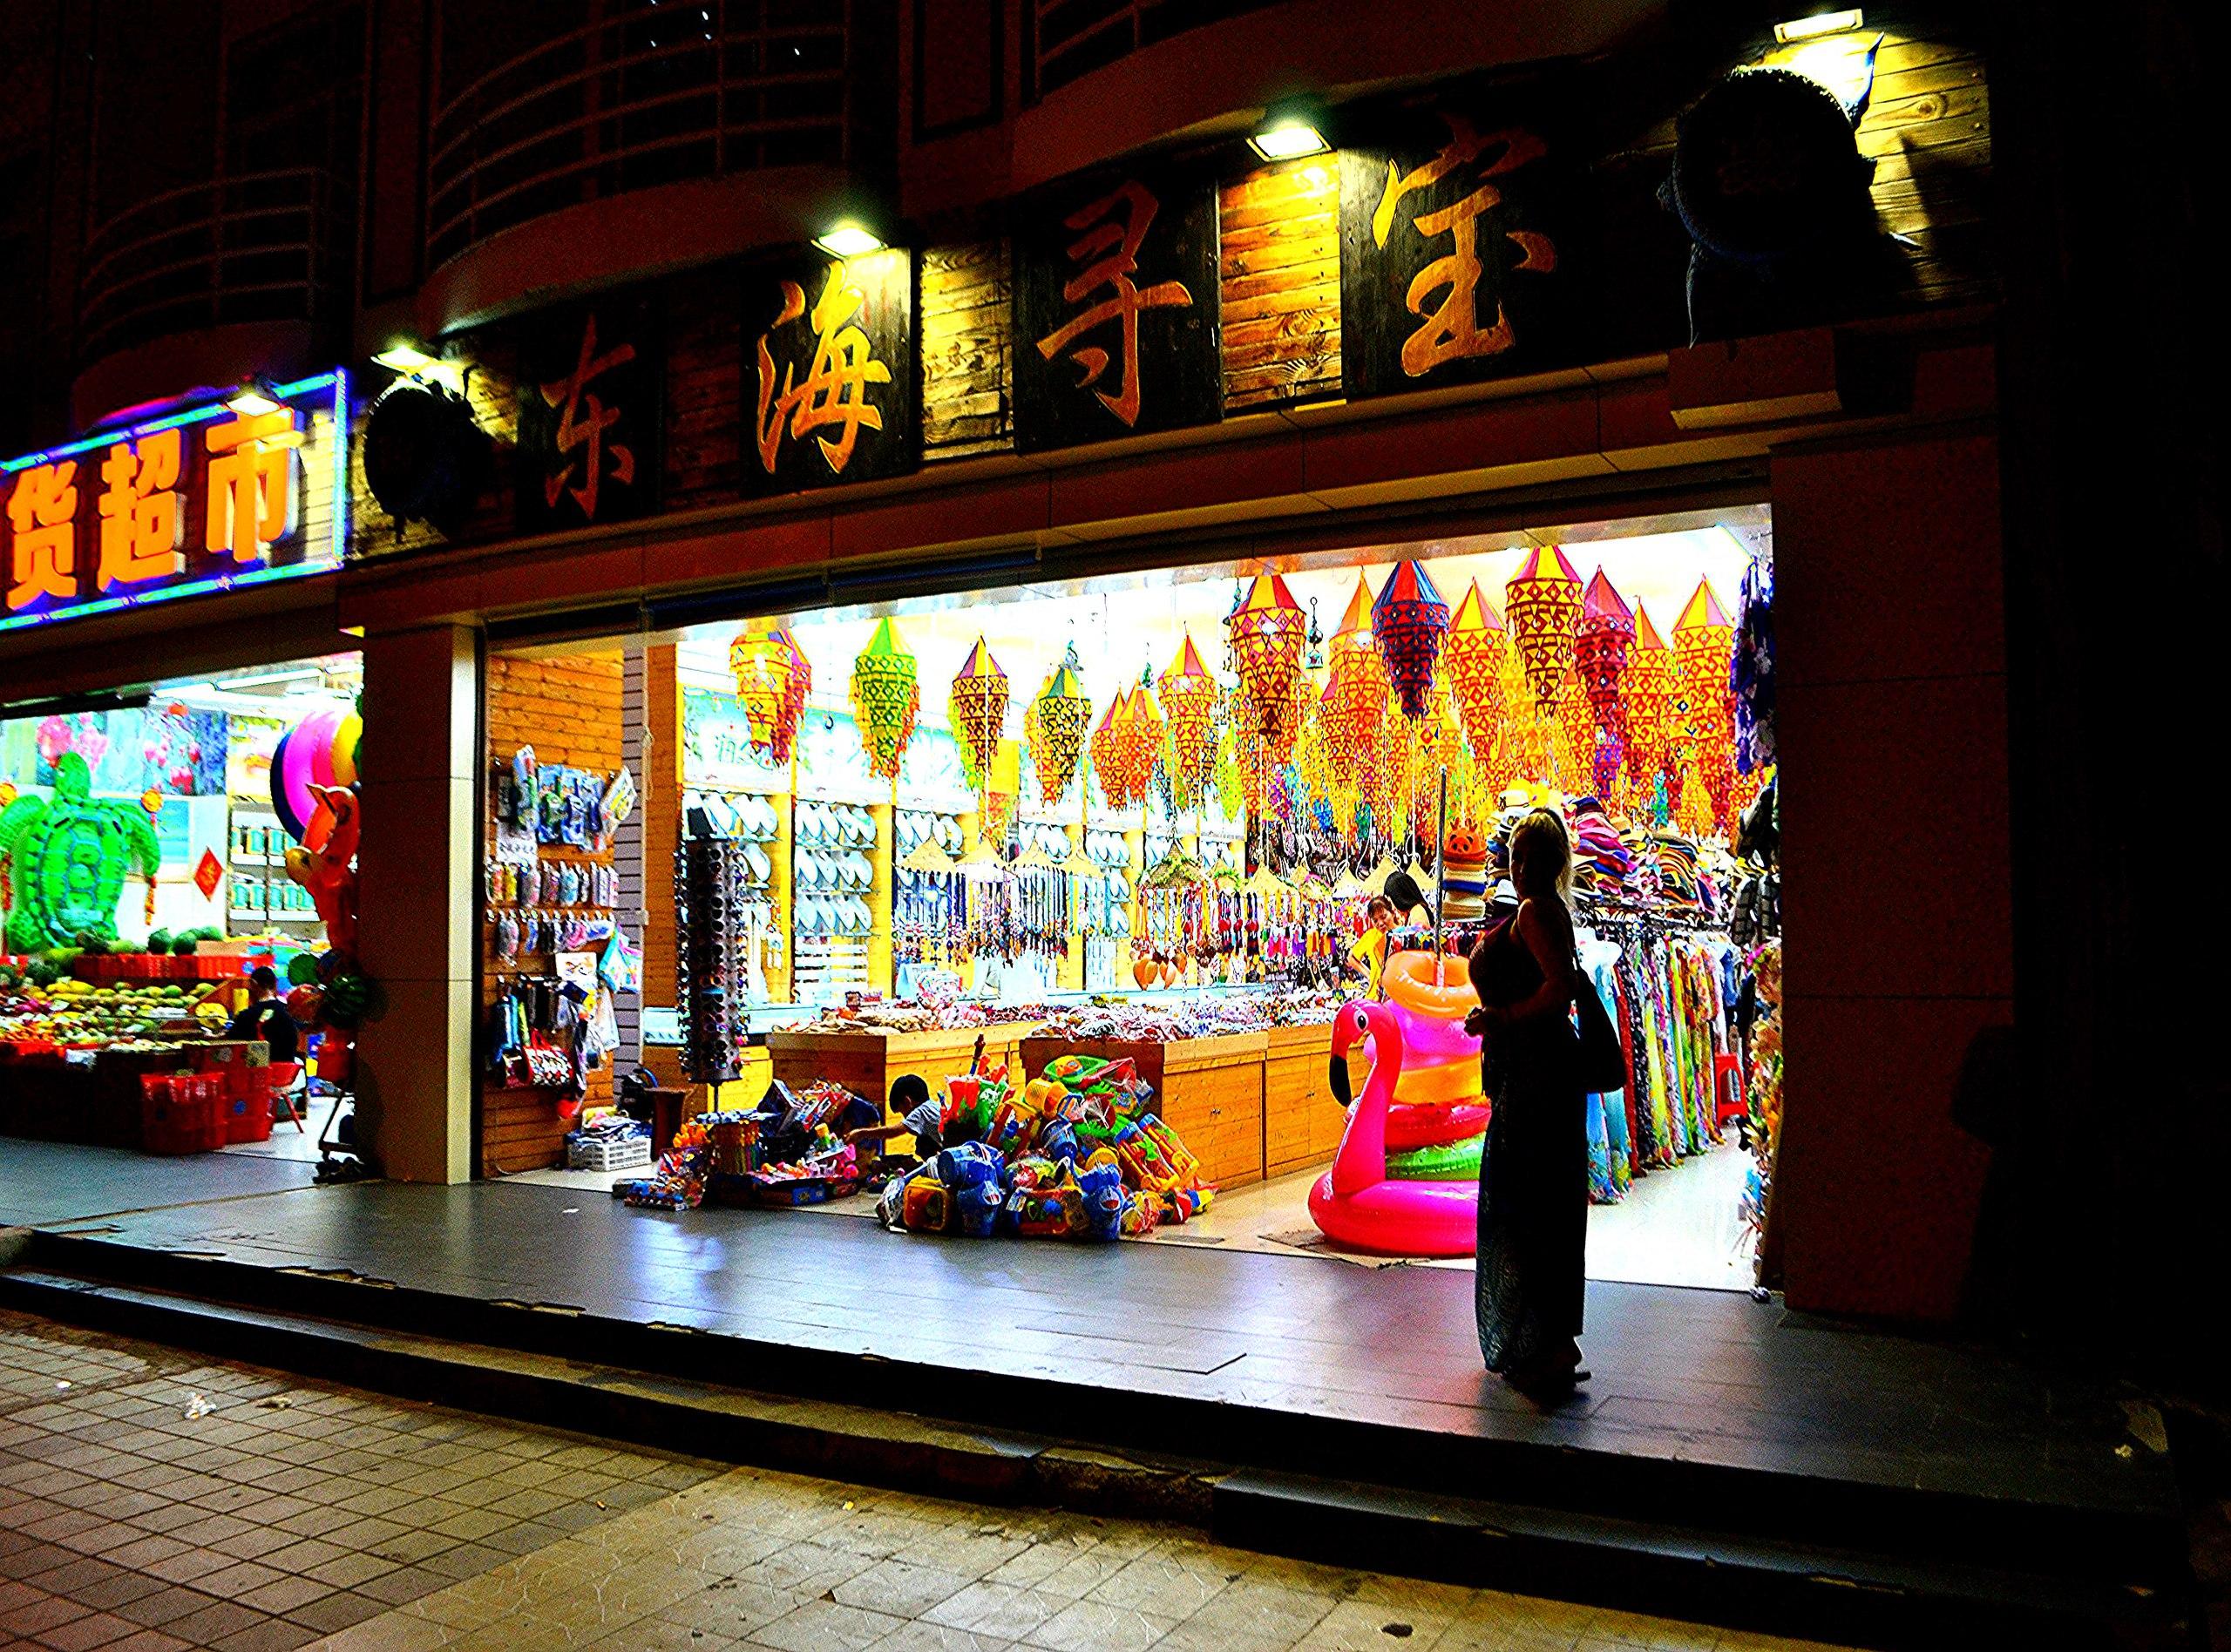 Елена Руденко (Валтея). Китай, о.Хайнань, г.Санья. (фото) - Страница 2 4wdZJ_Xe4G4